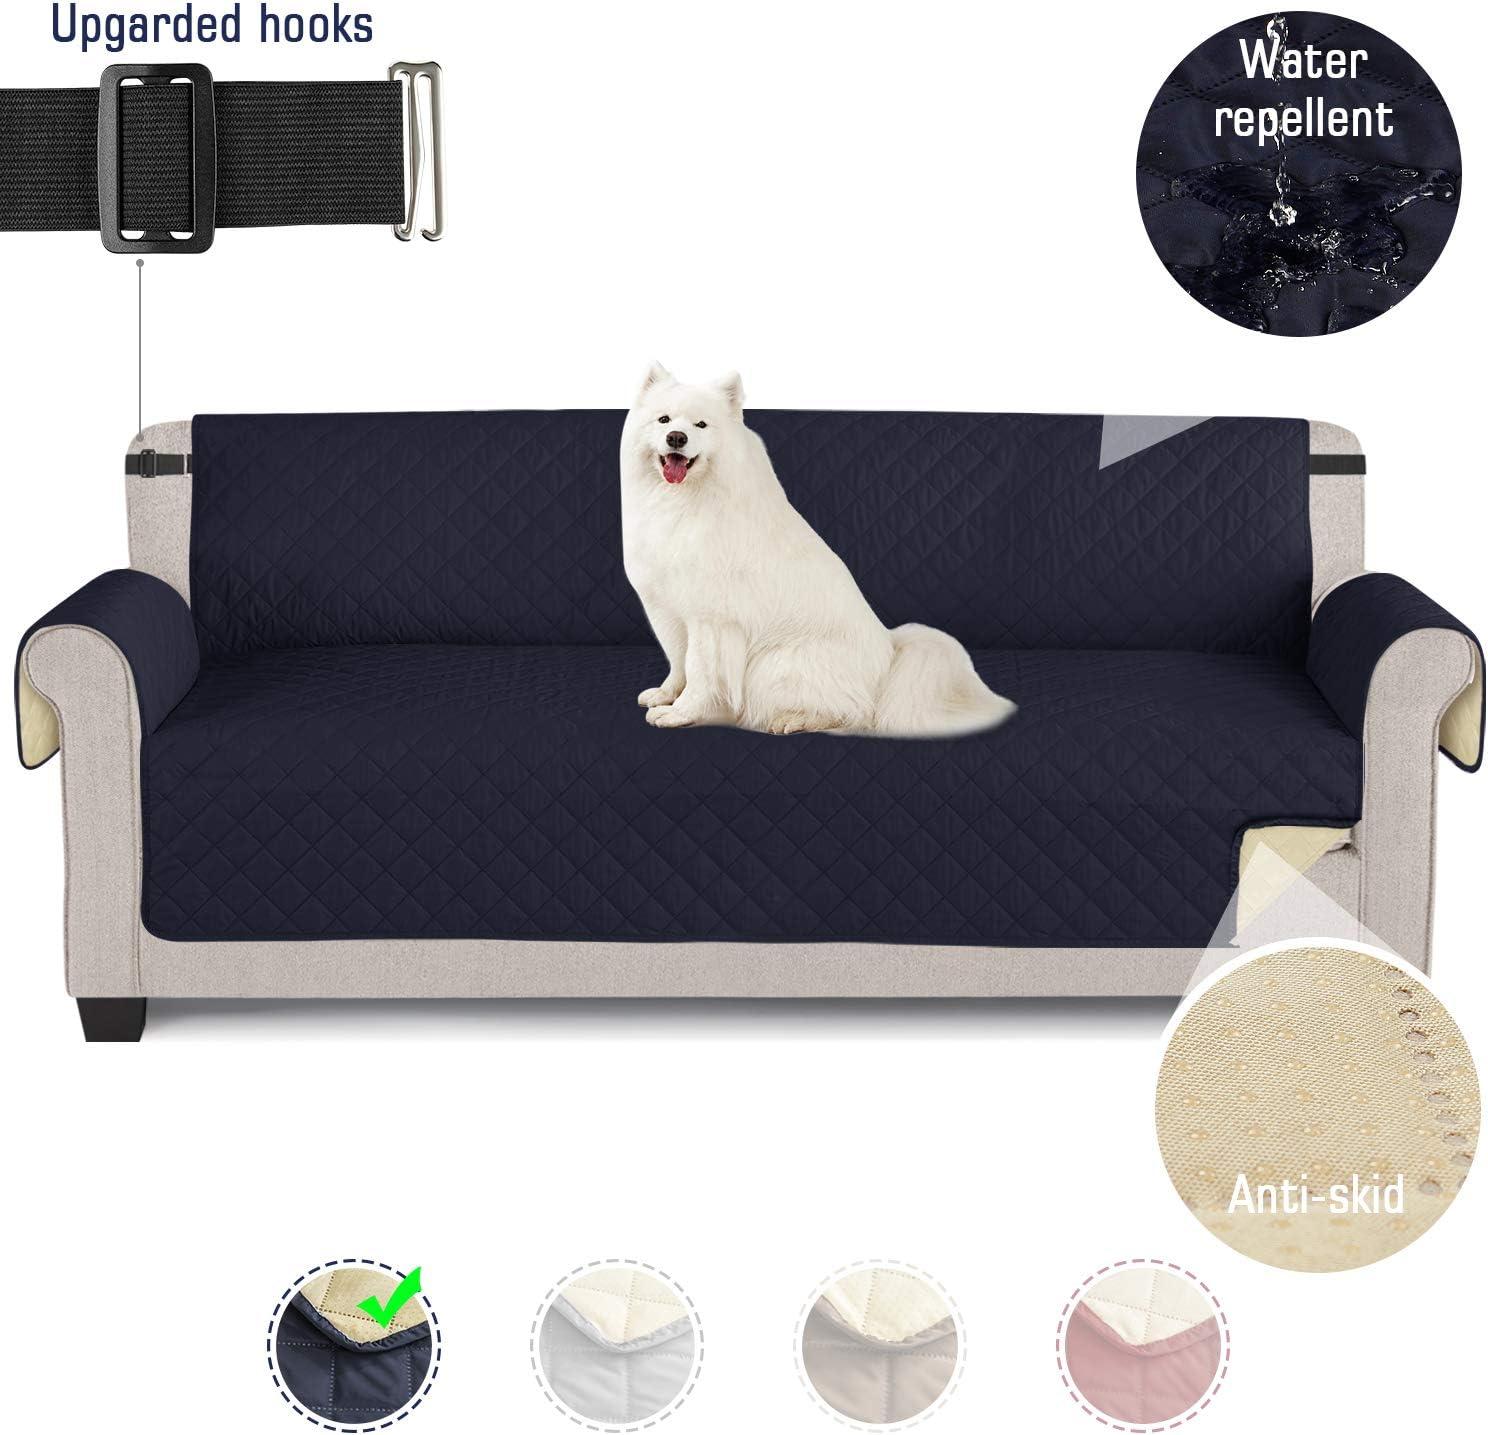 TAOCOCO Funda de sofá Impermeable Funda de cojín de protección para Mascotas Funda de sofá antisuciedad (Azul/ 4 Plazas 195 * 218cm)